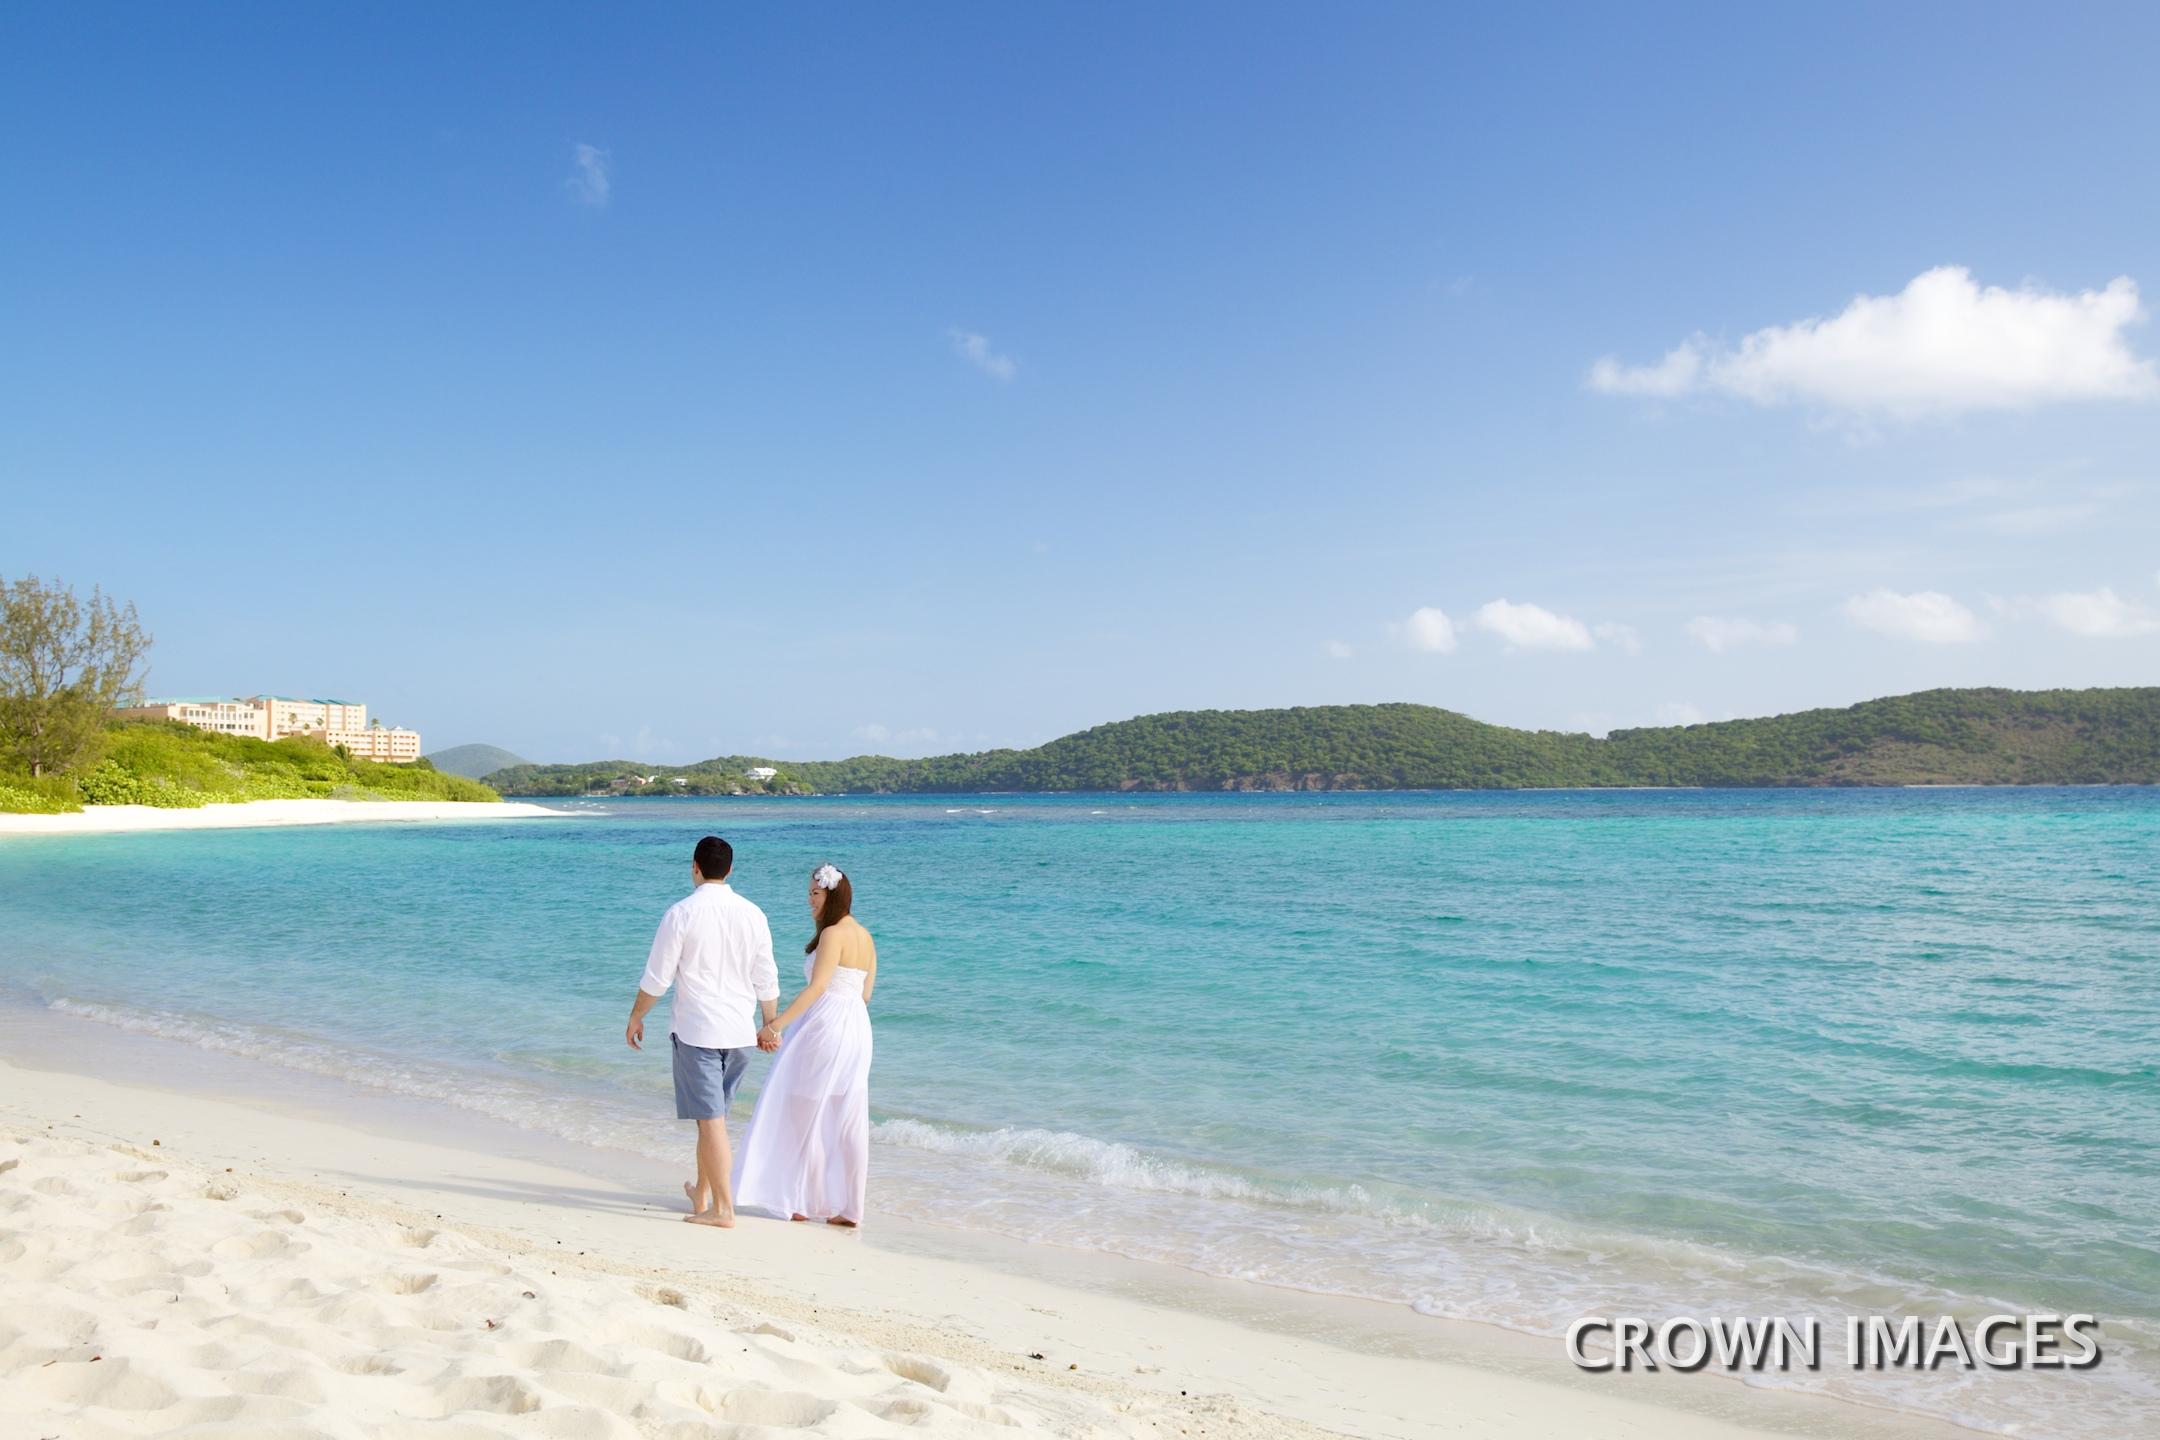 st thomas beach locations for photos